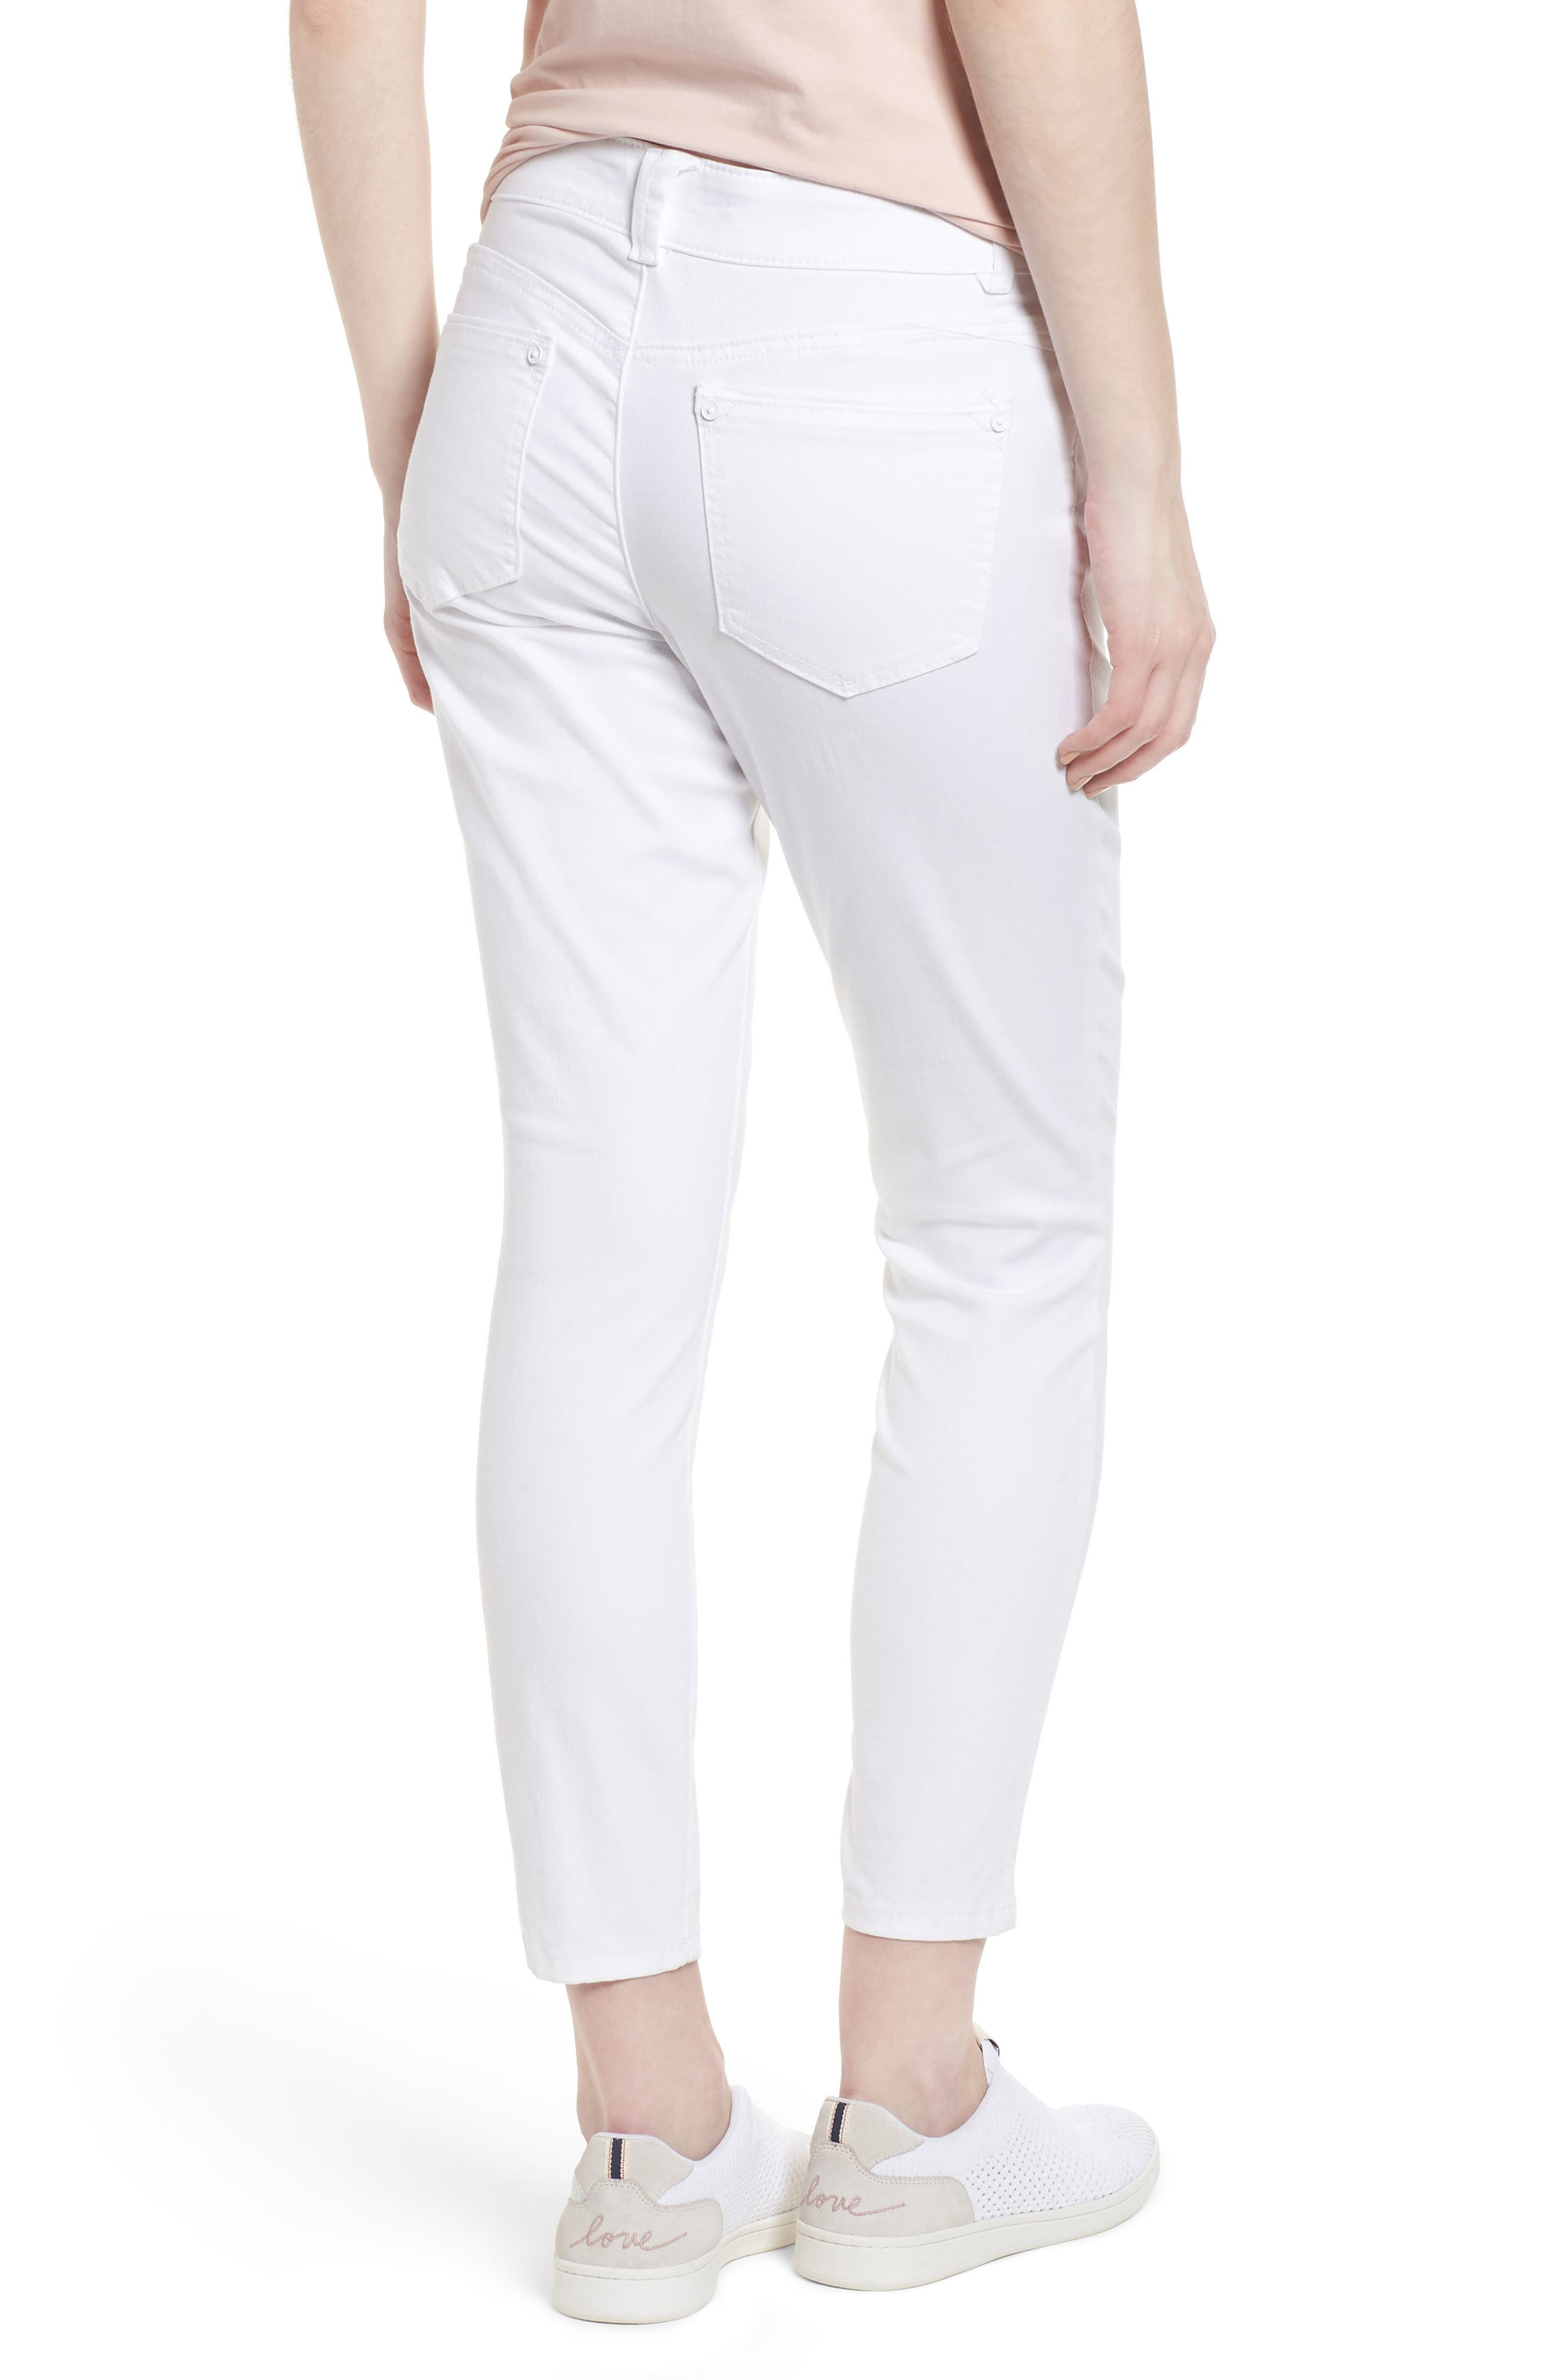 Ab-solution Ankle Skimmer Jeans,                             Alternate thumbnail 2, color,